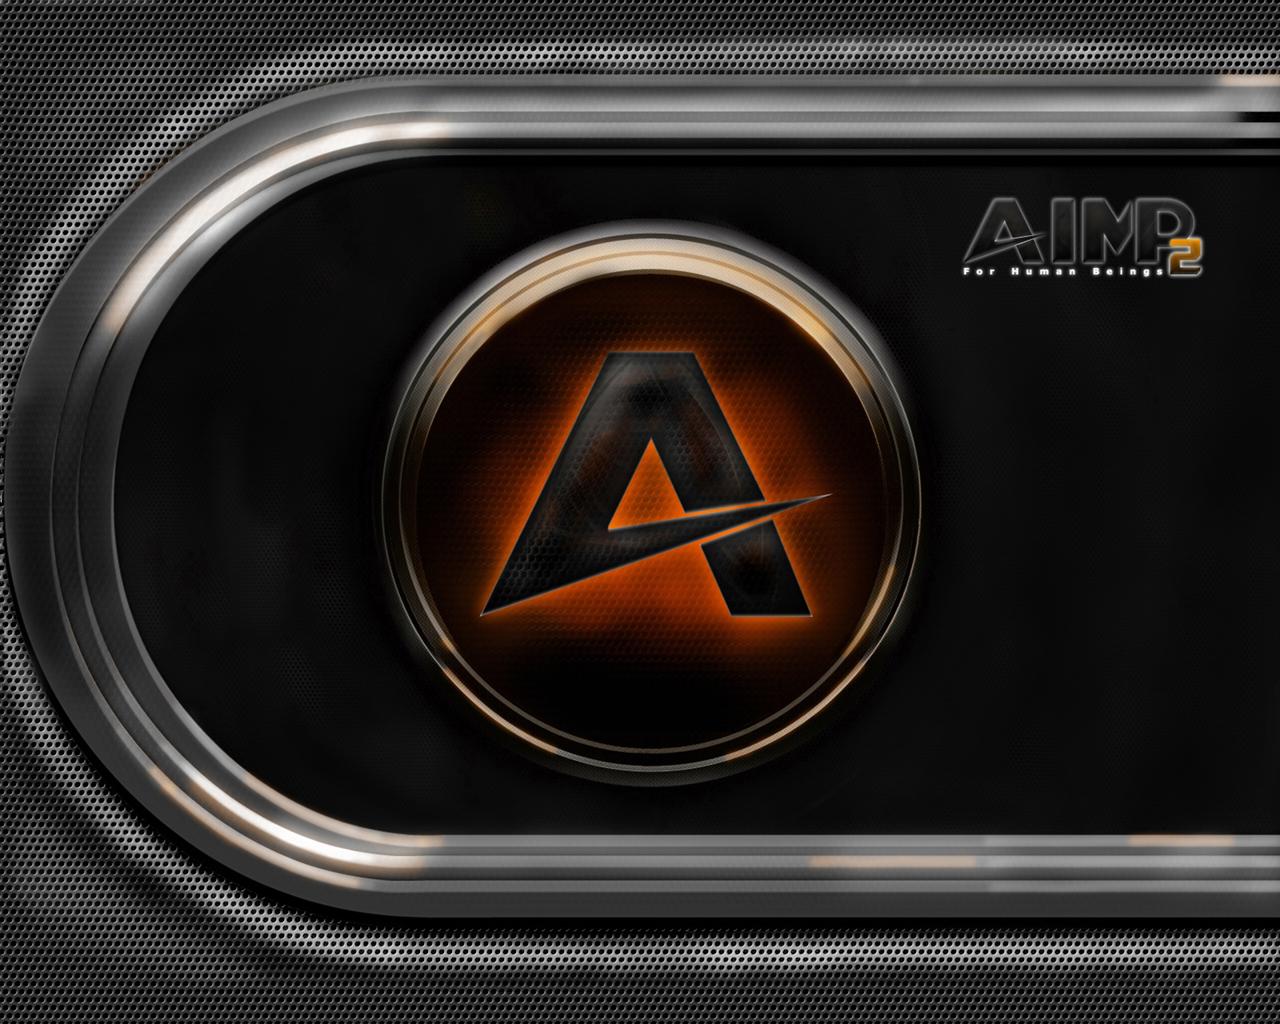 HQ Aimp2 Wallpapers | File 715.99Kb